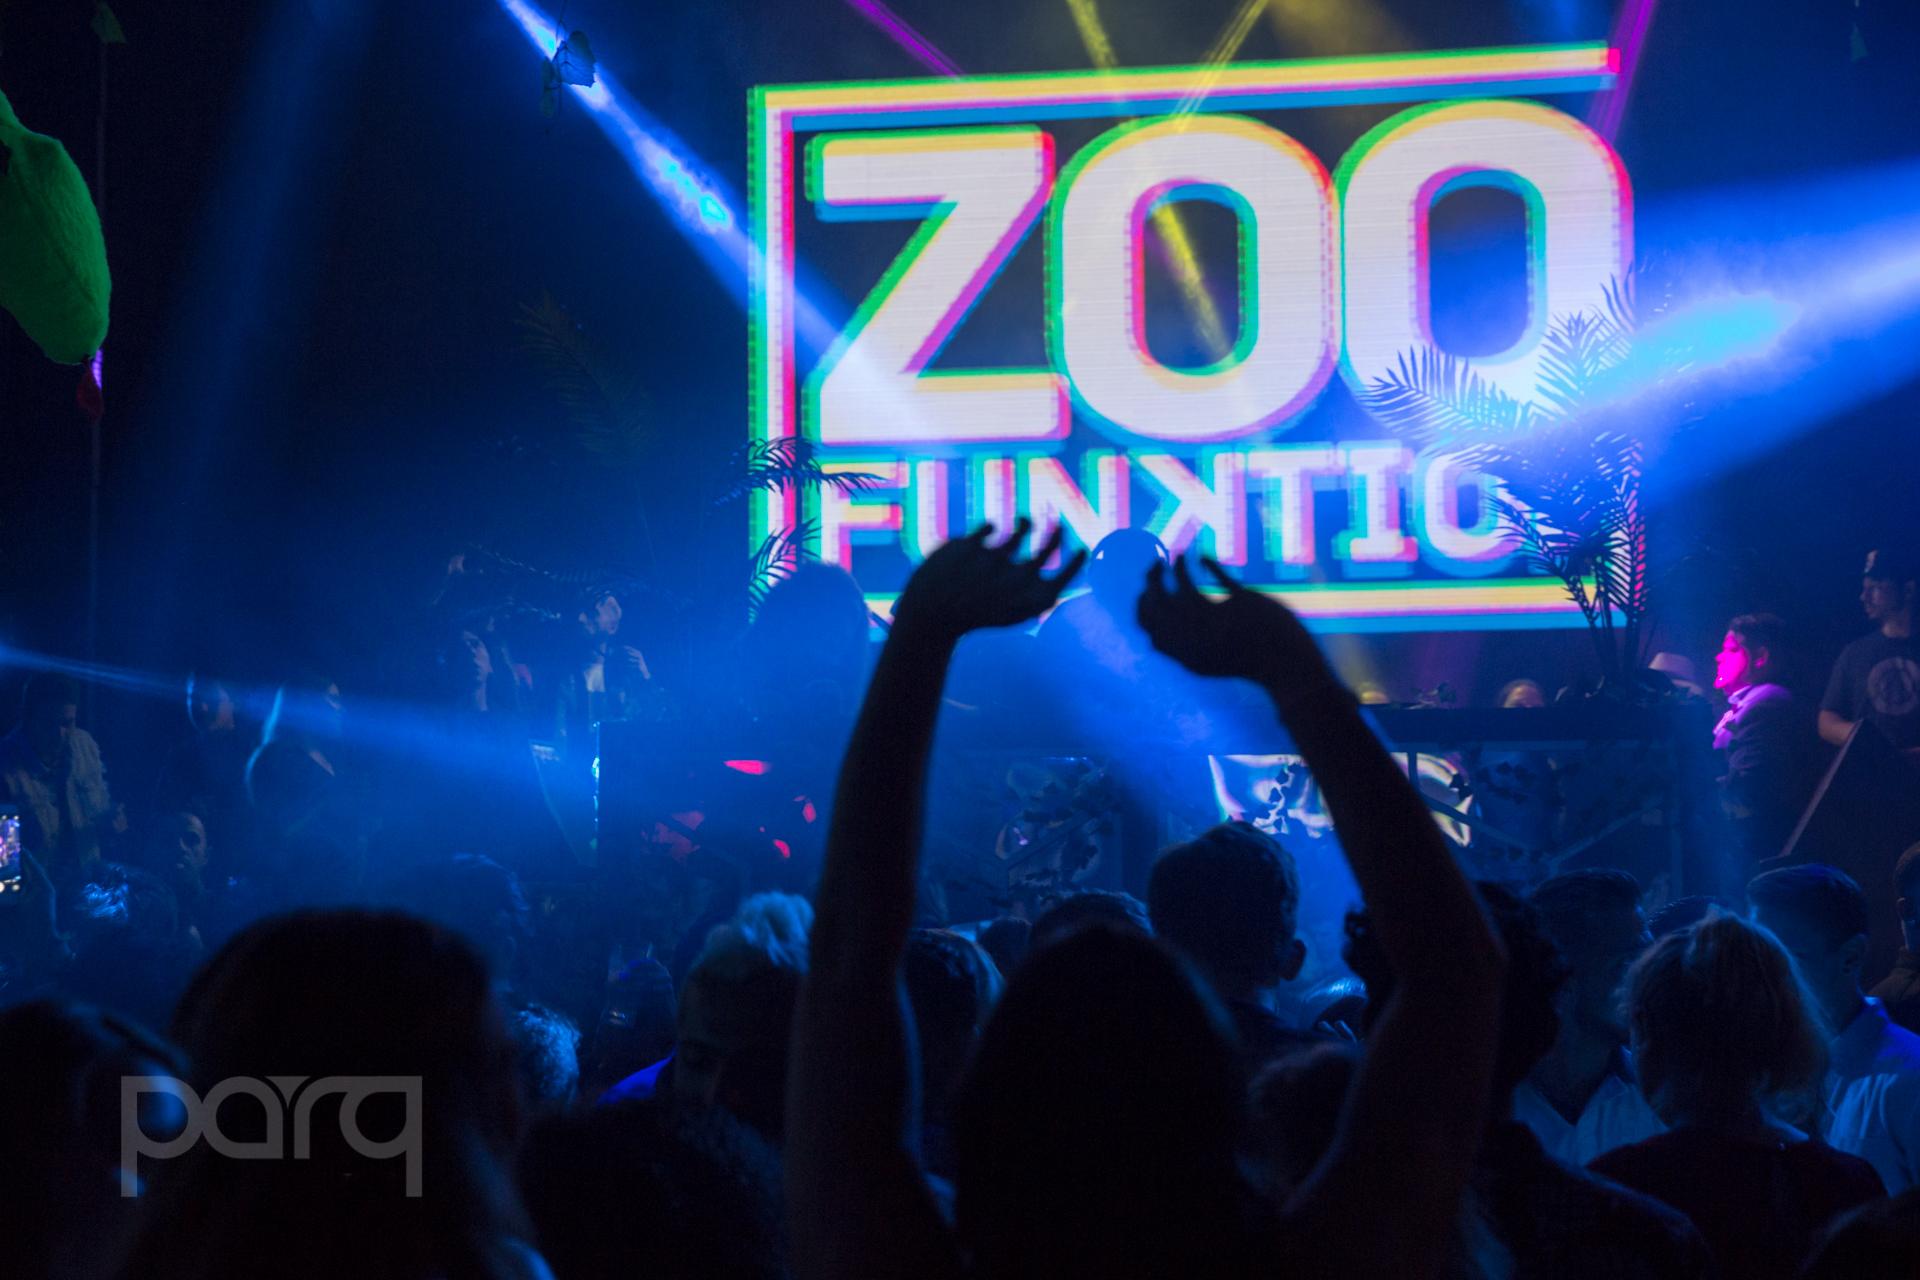 04.22.17 Zoo Funktion-1.jpg